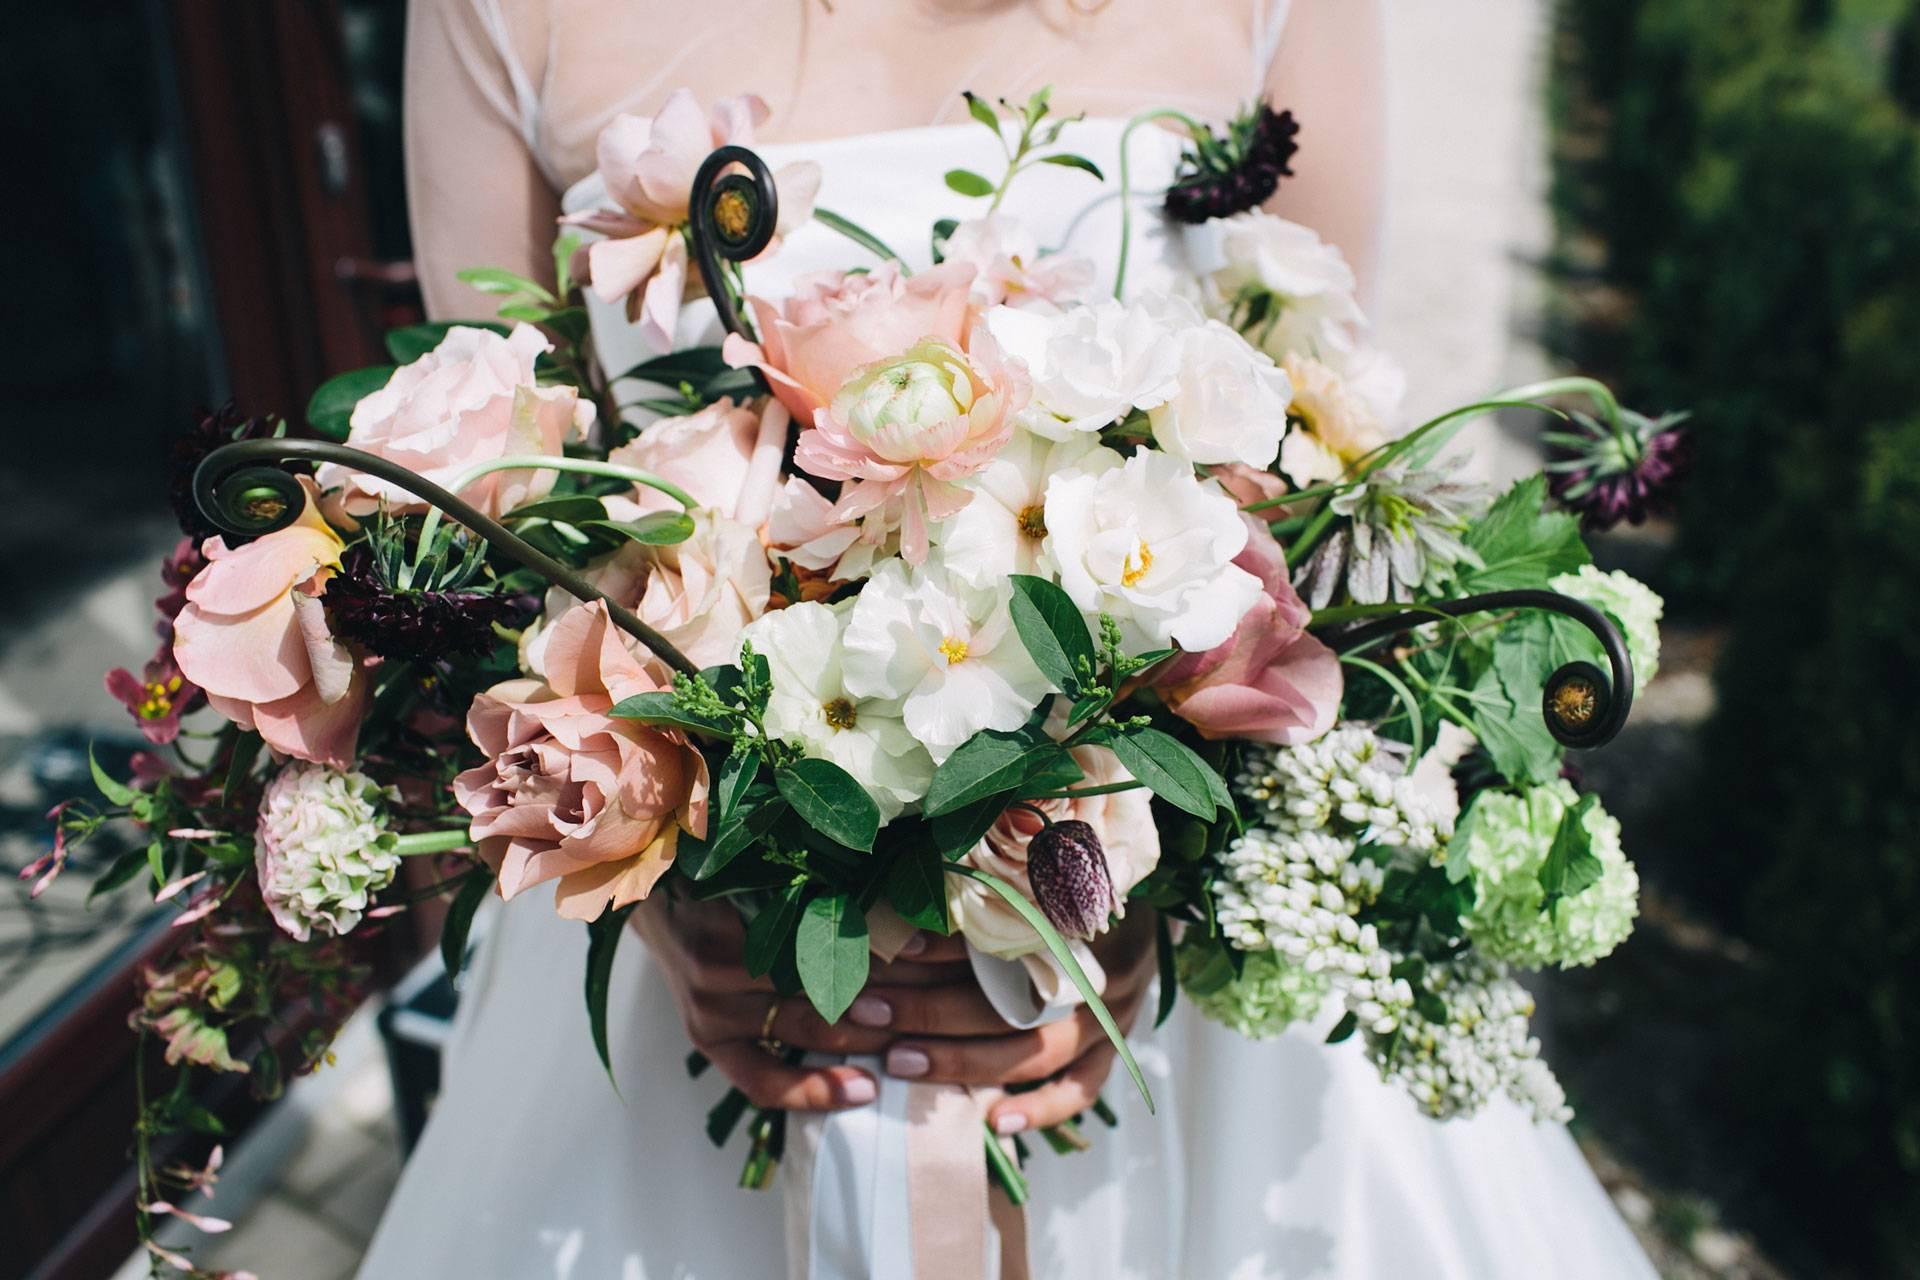 Обязанности жениха на свадьбе – легко и трудно одновременно